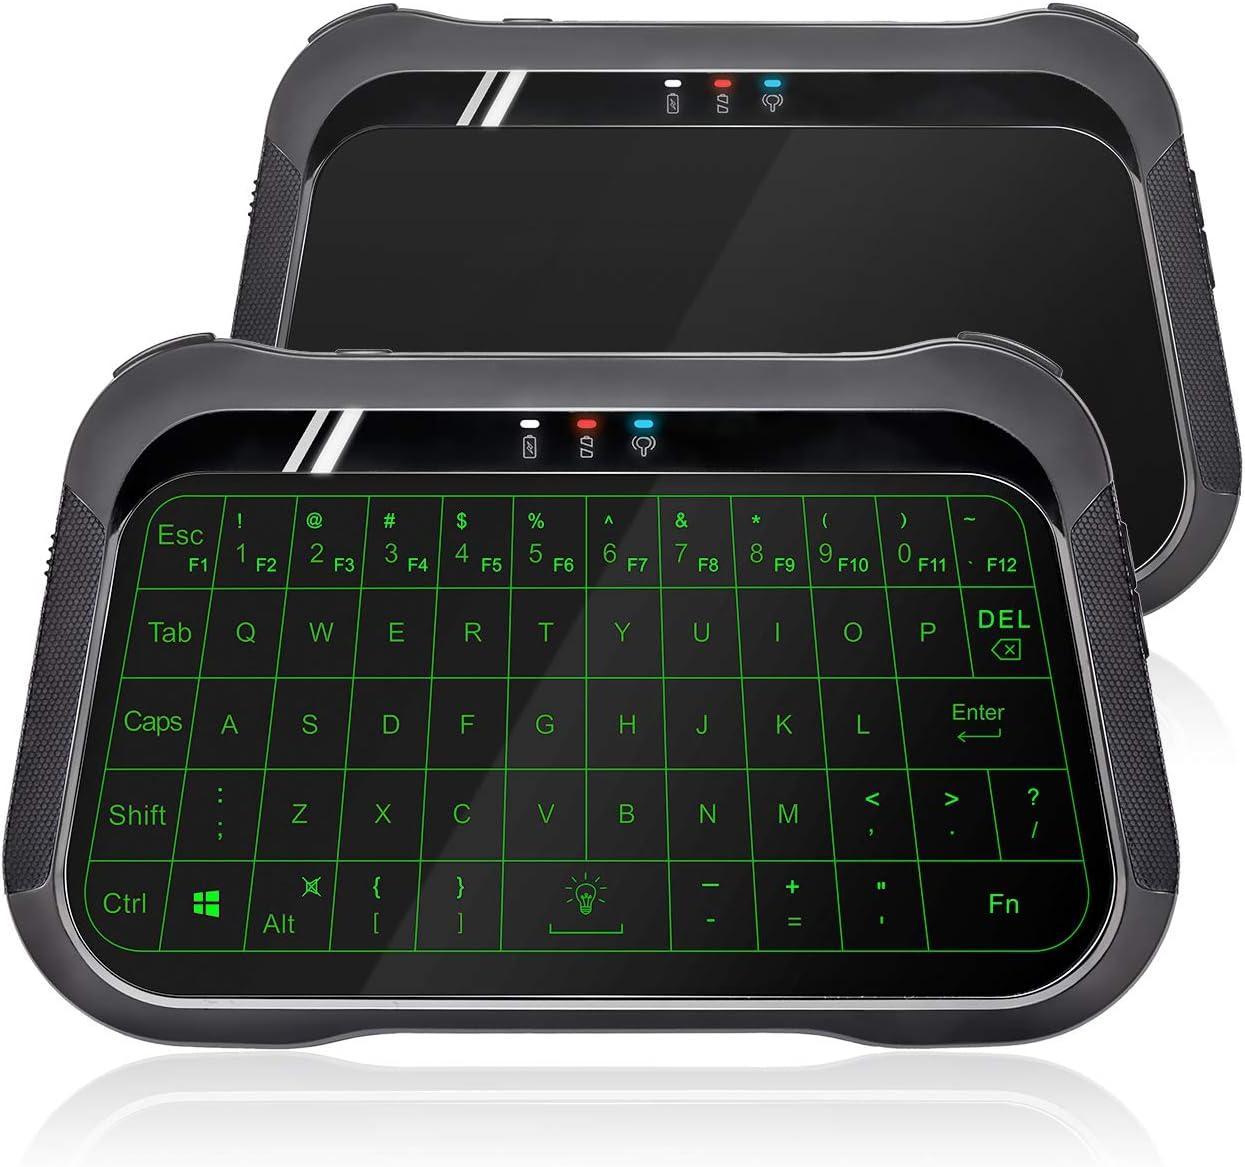 ANEWISH 2.4GHz Mini Wireless Keyboard with Touchpad